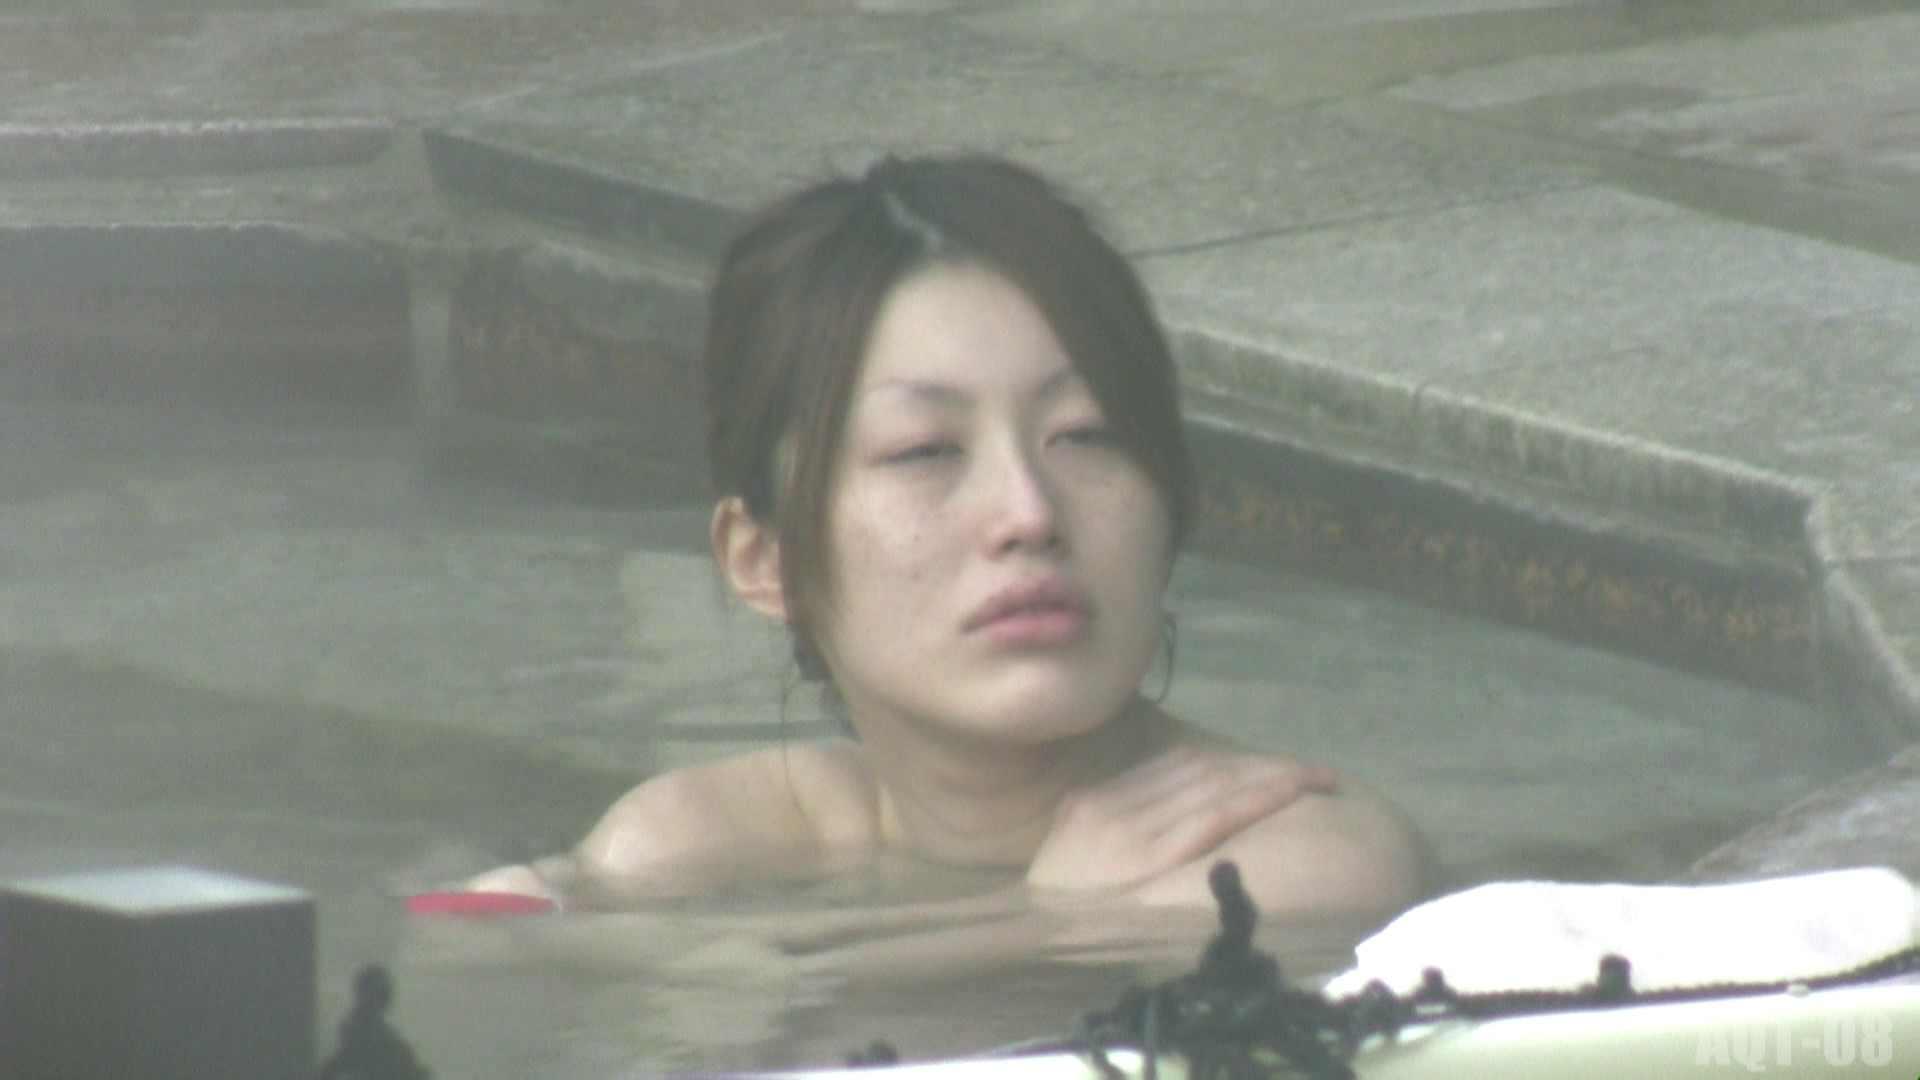 Aquaな露天風呂Vol.775 盗撮映像  74Pix 19